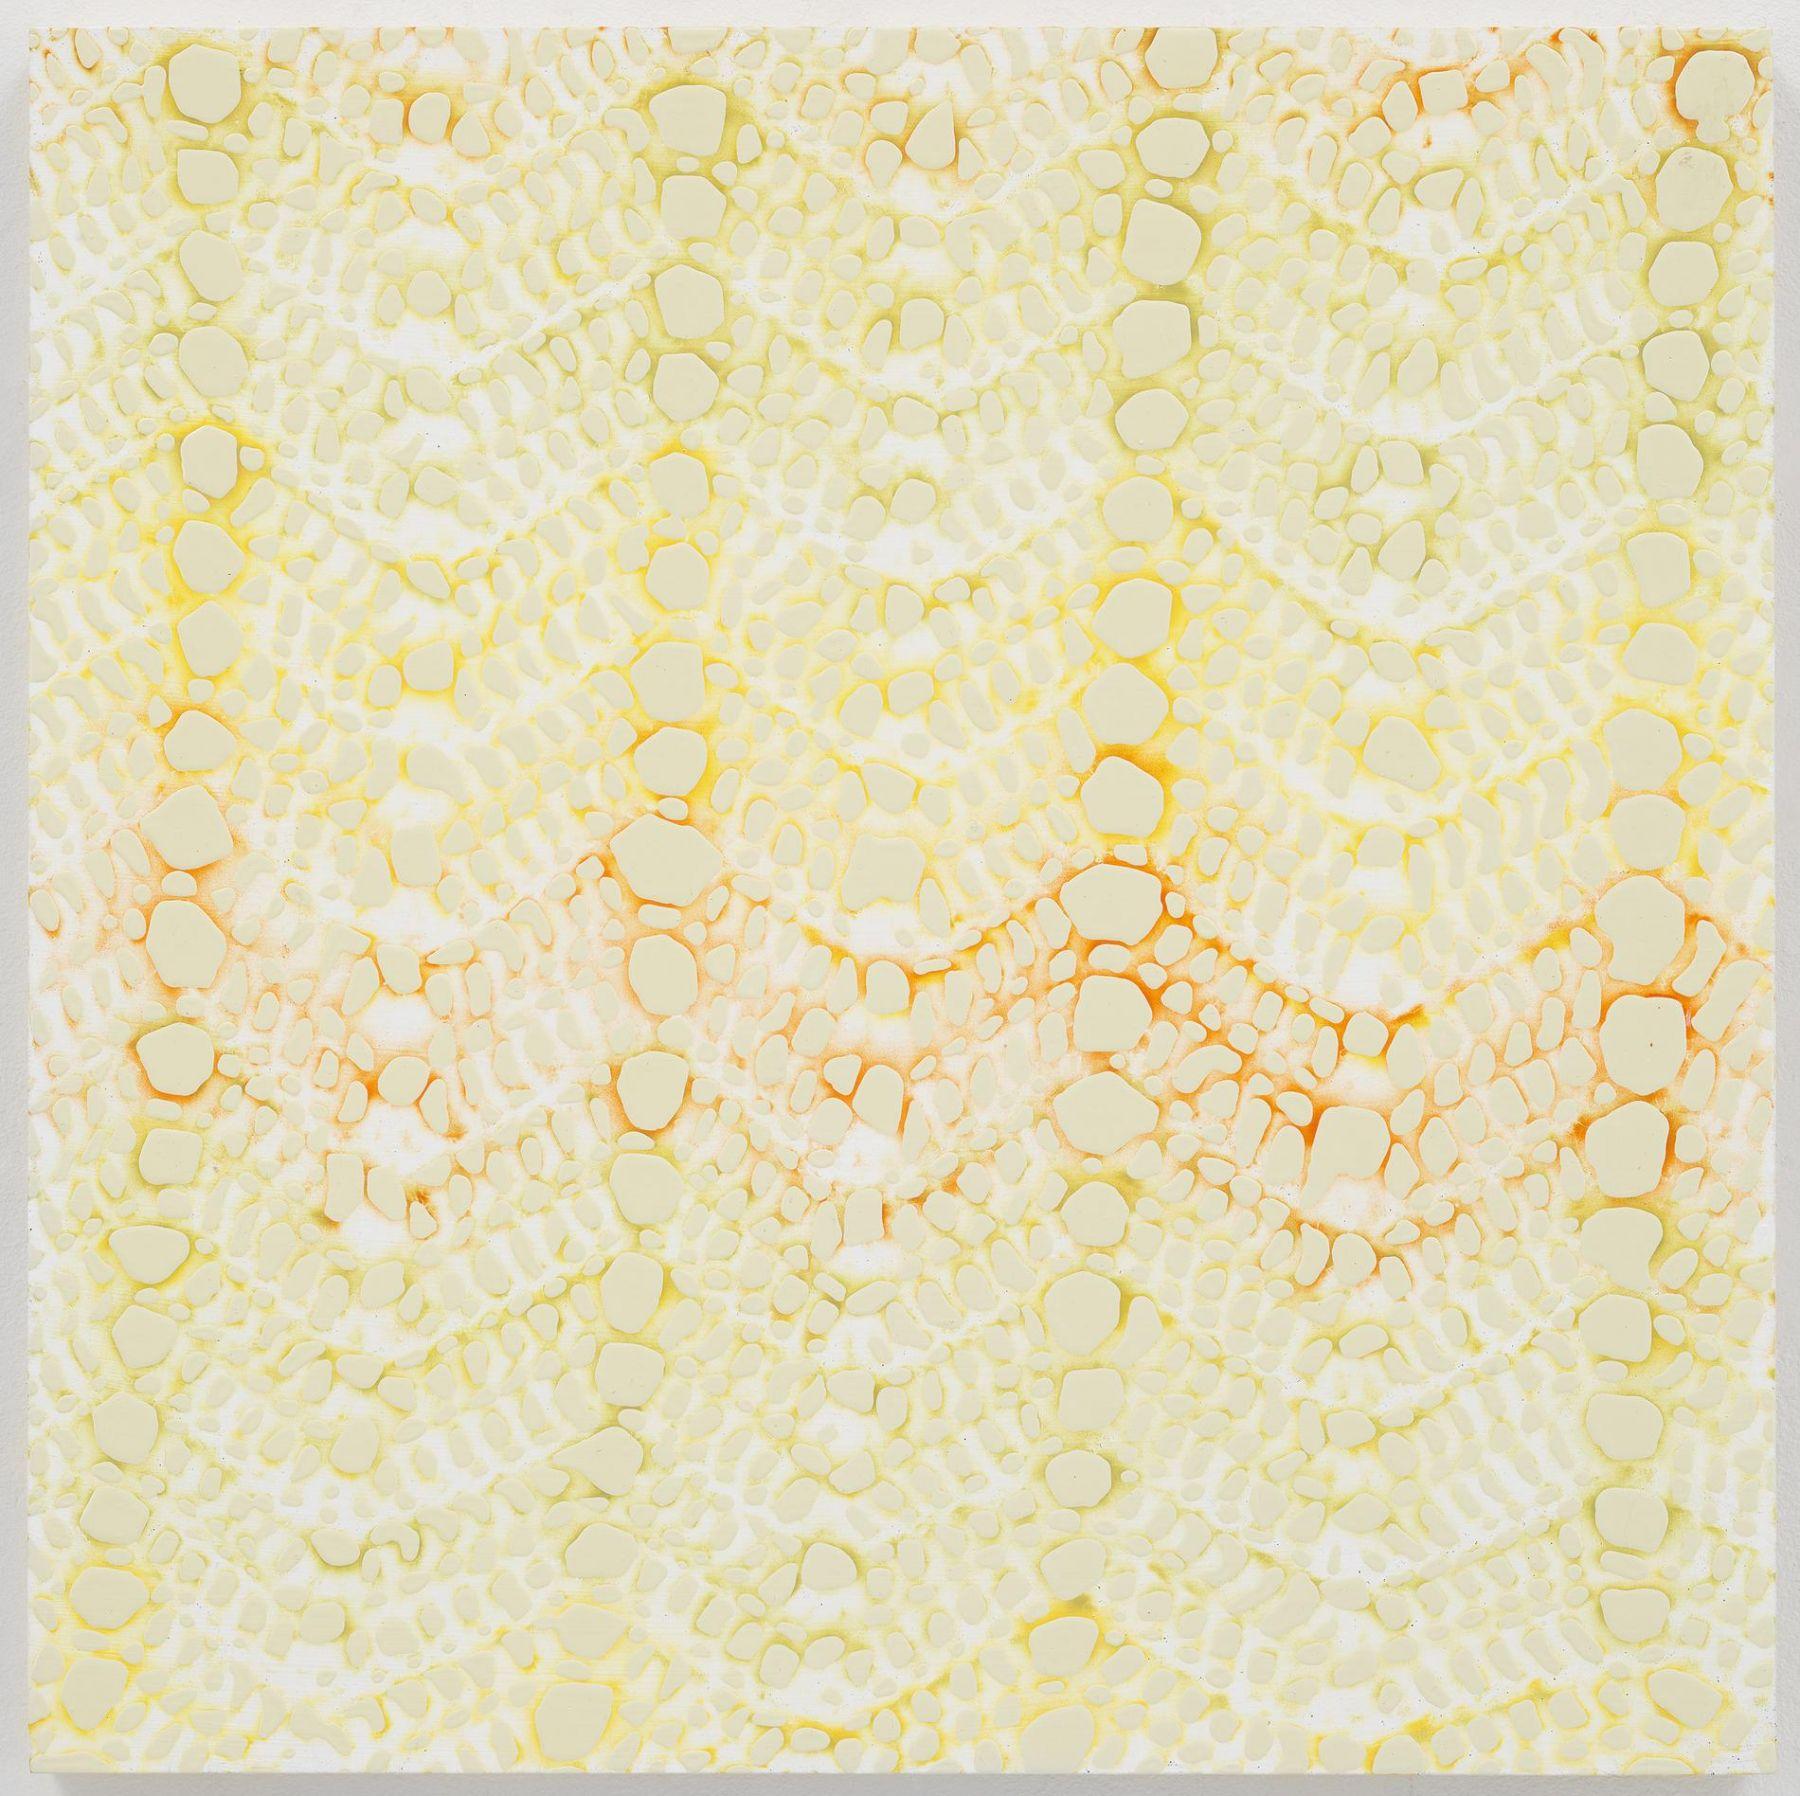 , MICHELLE GRABNERUntitled,2014 Enamel on panel 18 x 18 x 3/4 in. (45.7 x 45.7 x 1.9 cm)